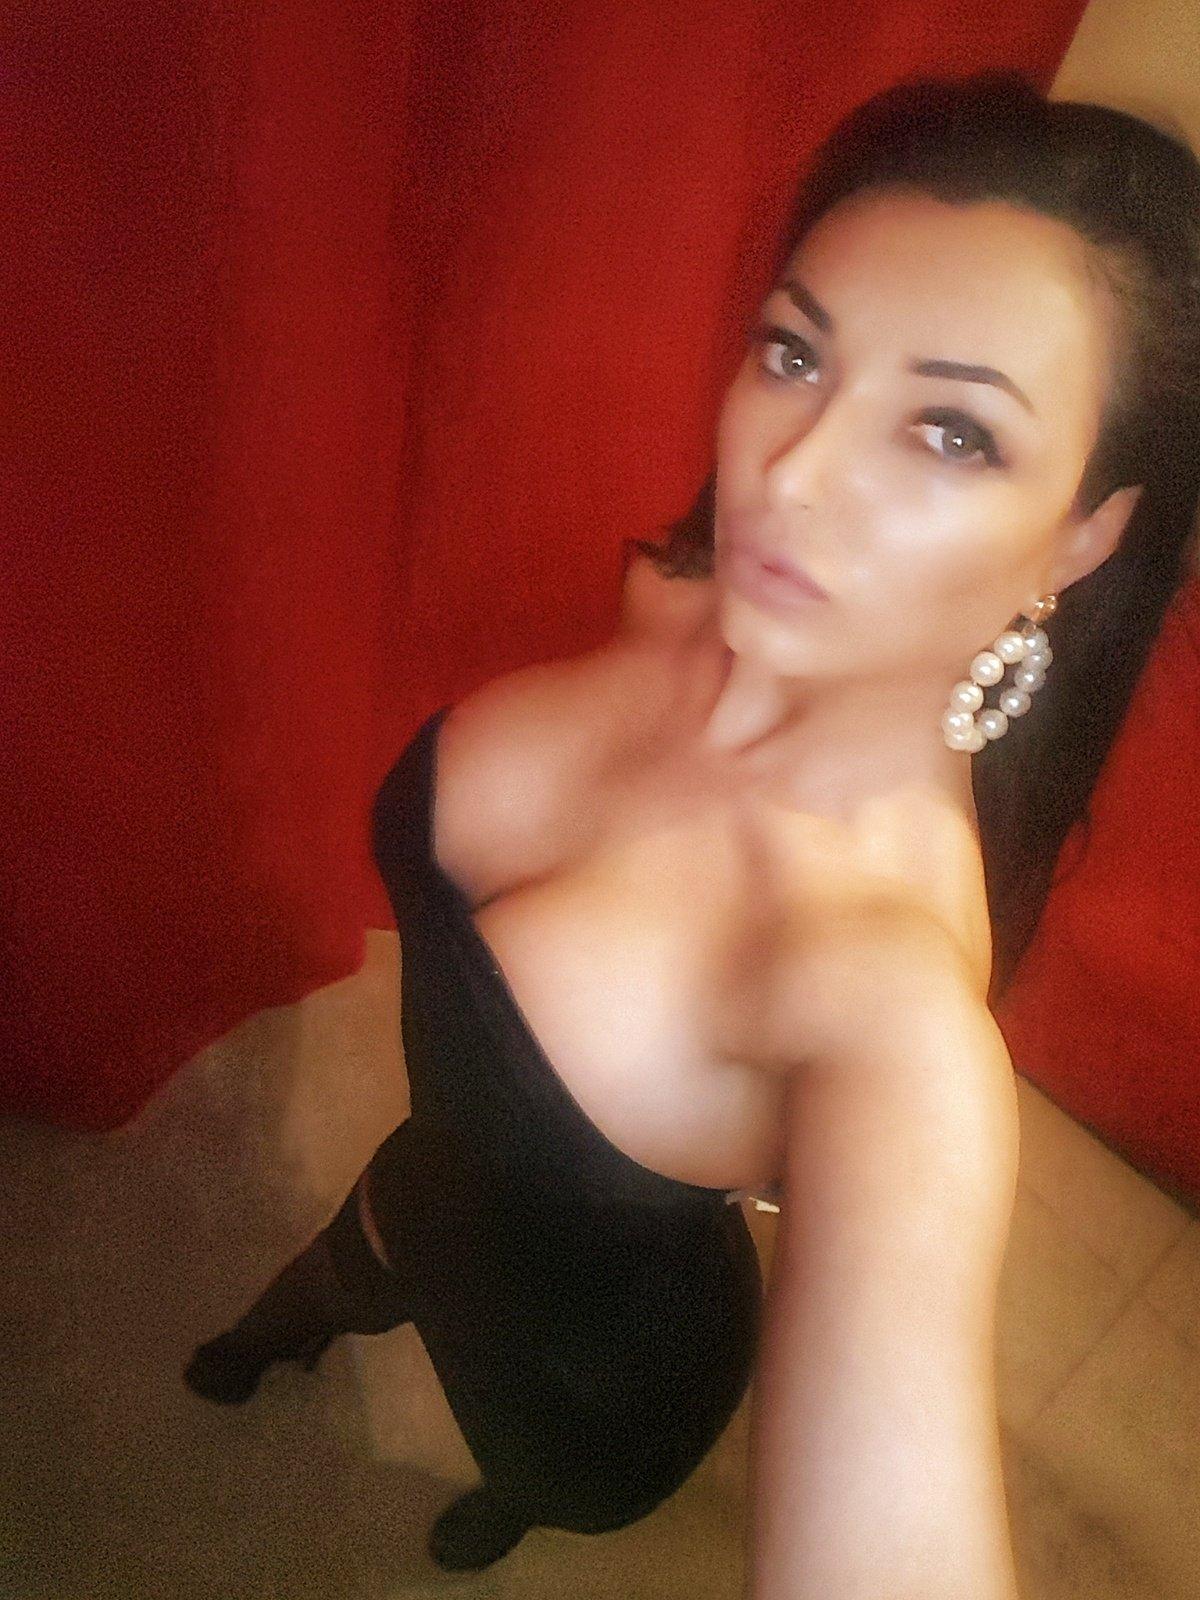 Bulgarian escorts Maria Bulgarian Real GFE, Bulgarian escort in Dubai